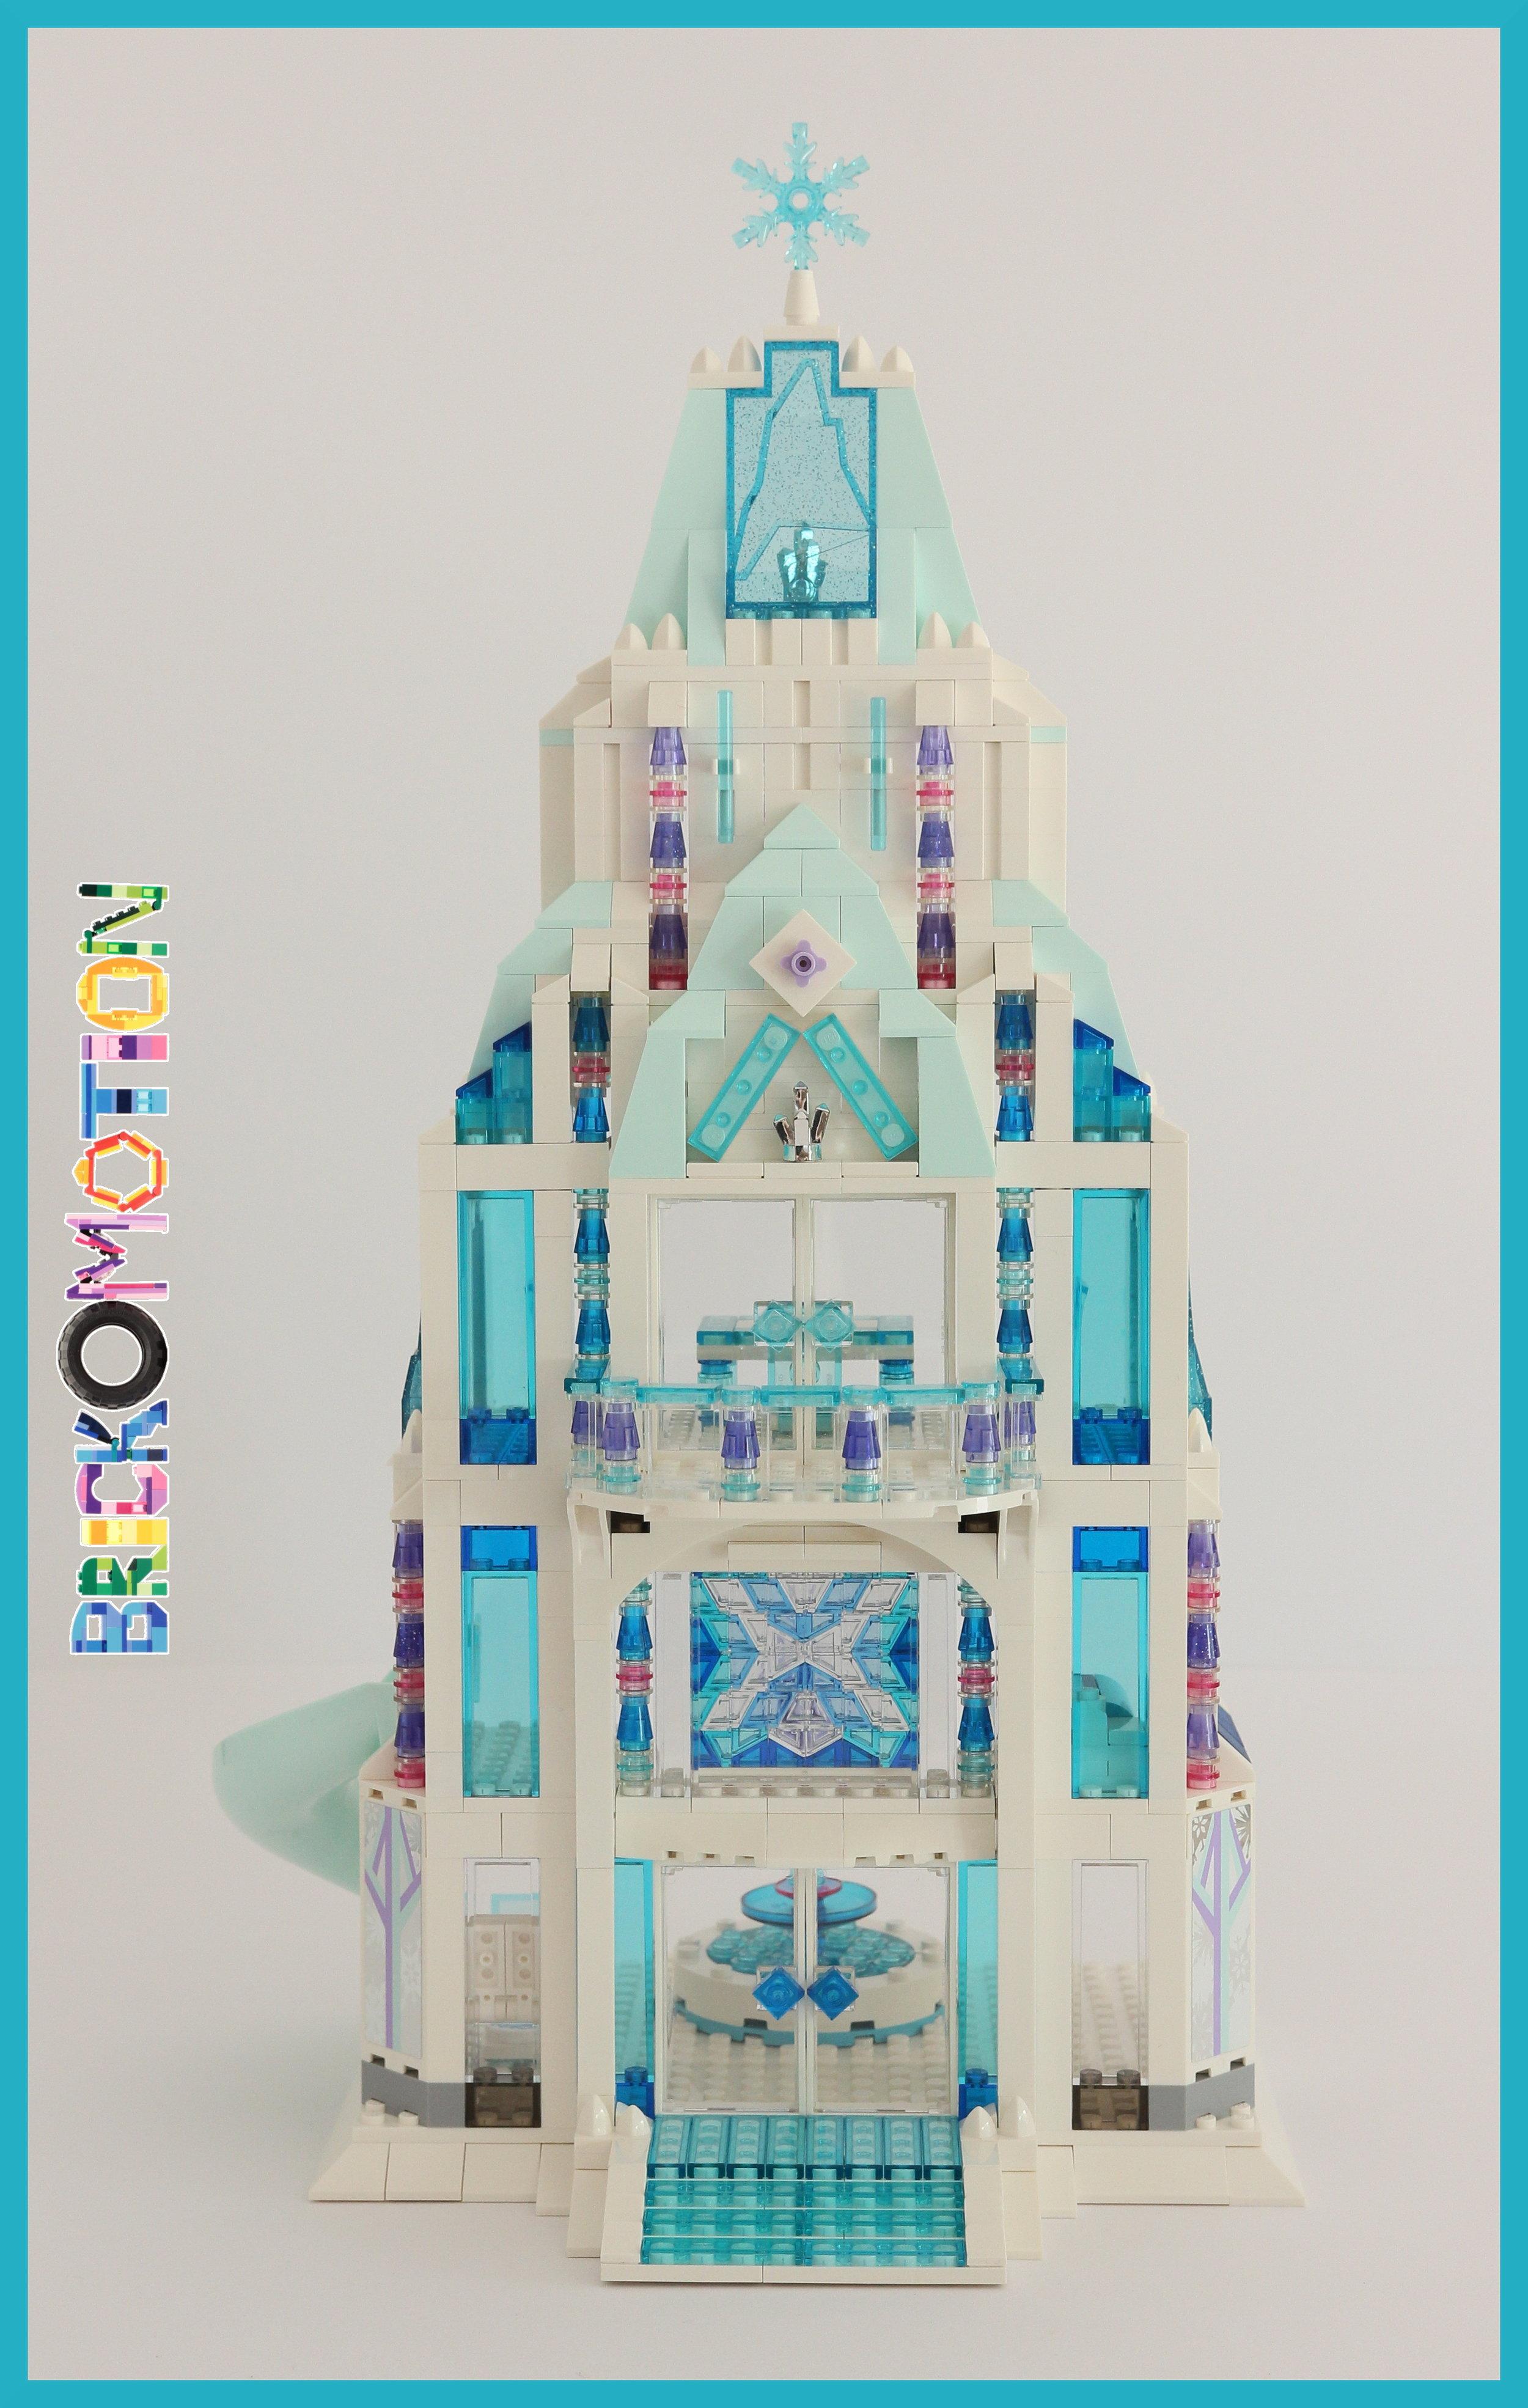 Elsa's palace